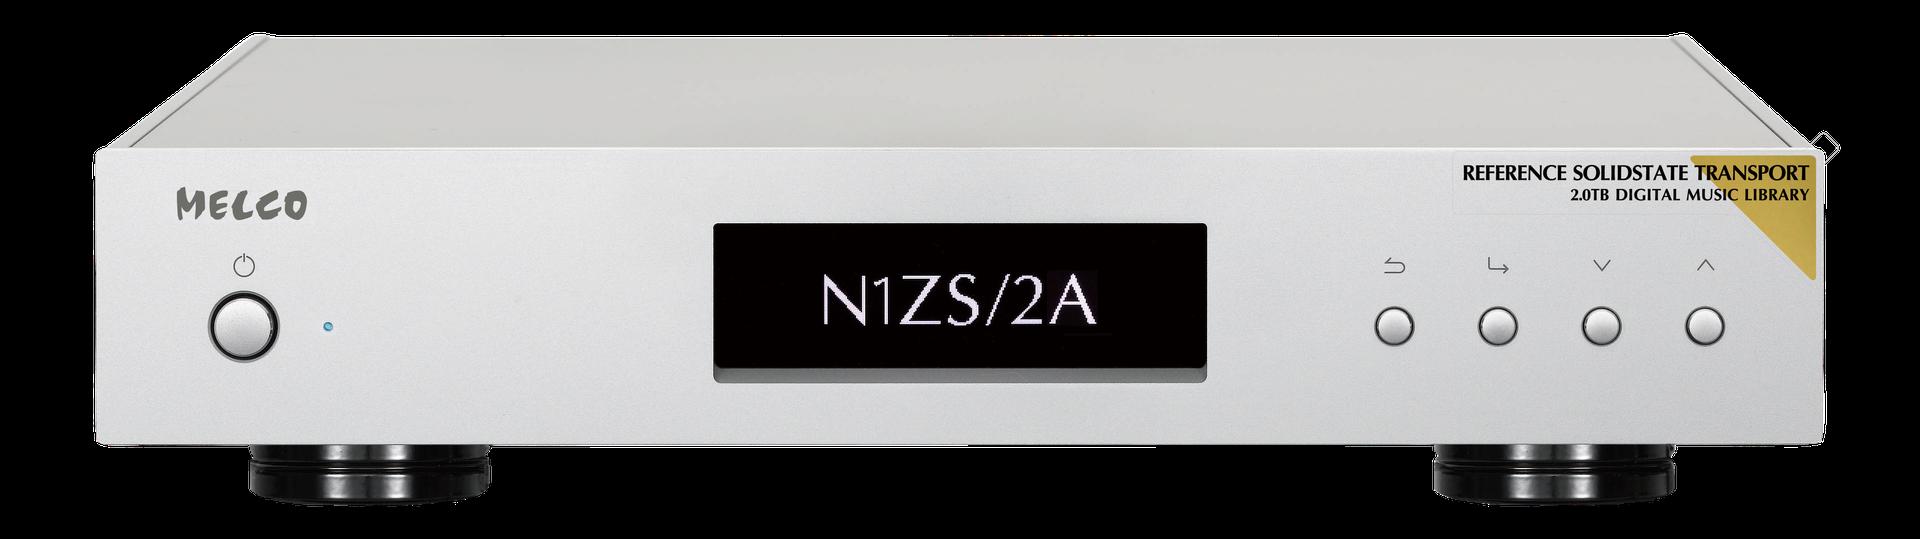 N1 MK2 - melco-audio